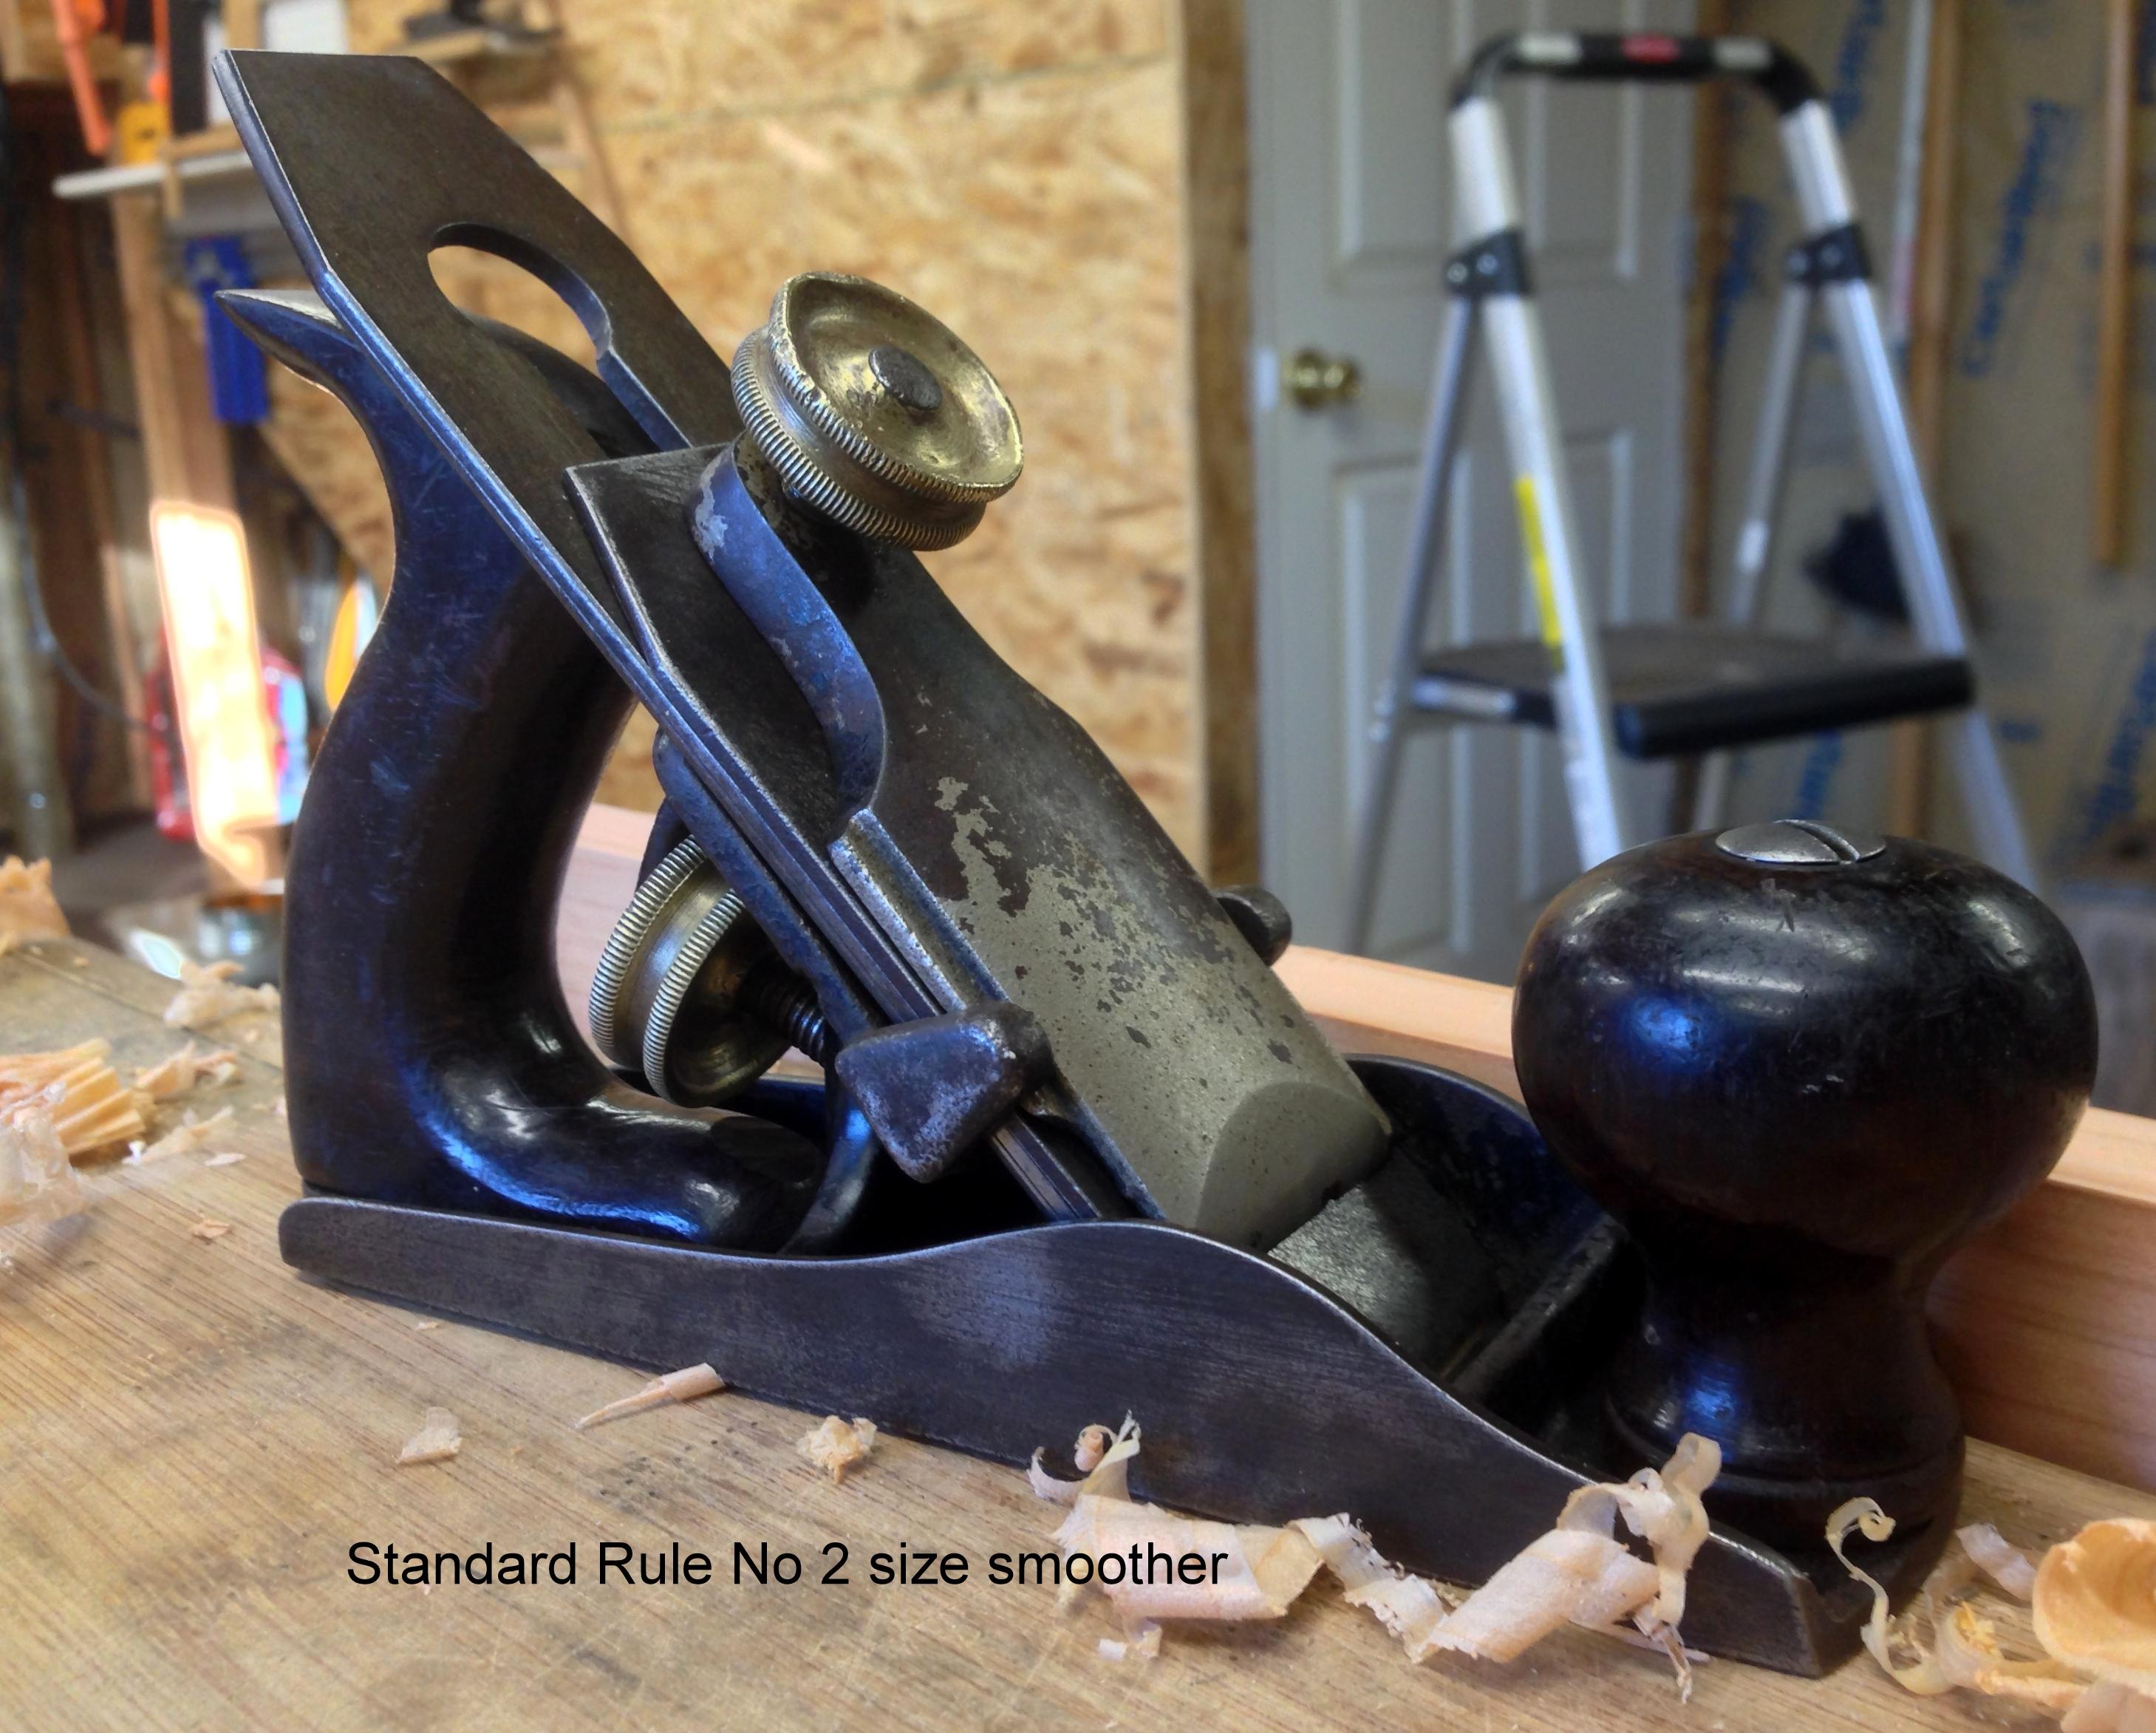 Standard Rule No 2 C1883